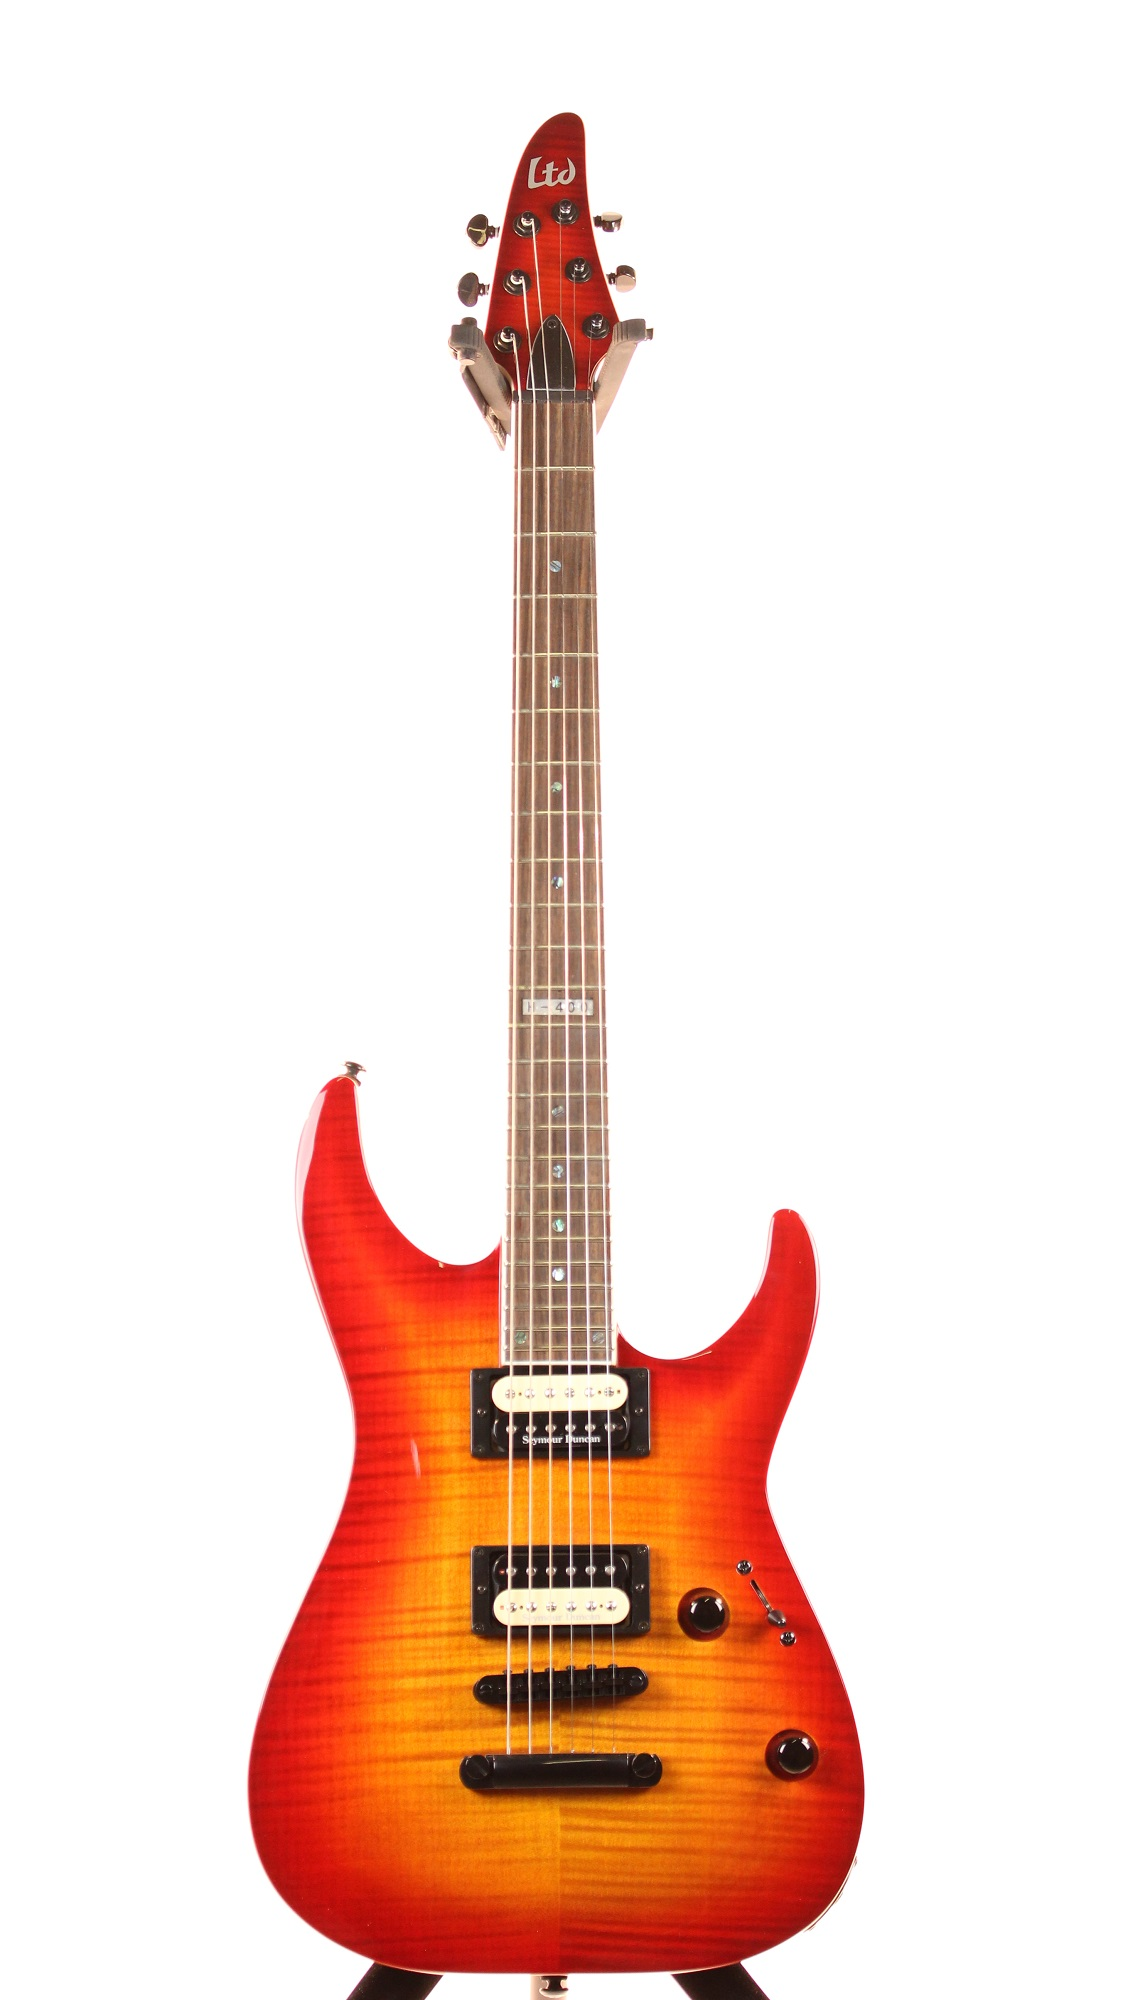 esp ltd h 400 sample prototype electric guitar 2005 6. Black Bedroom Furniture Sets. Home Design Ideas